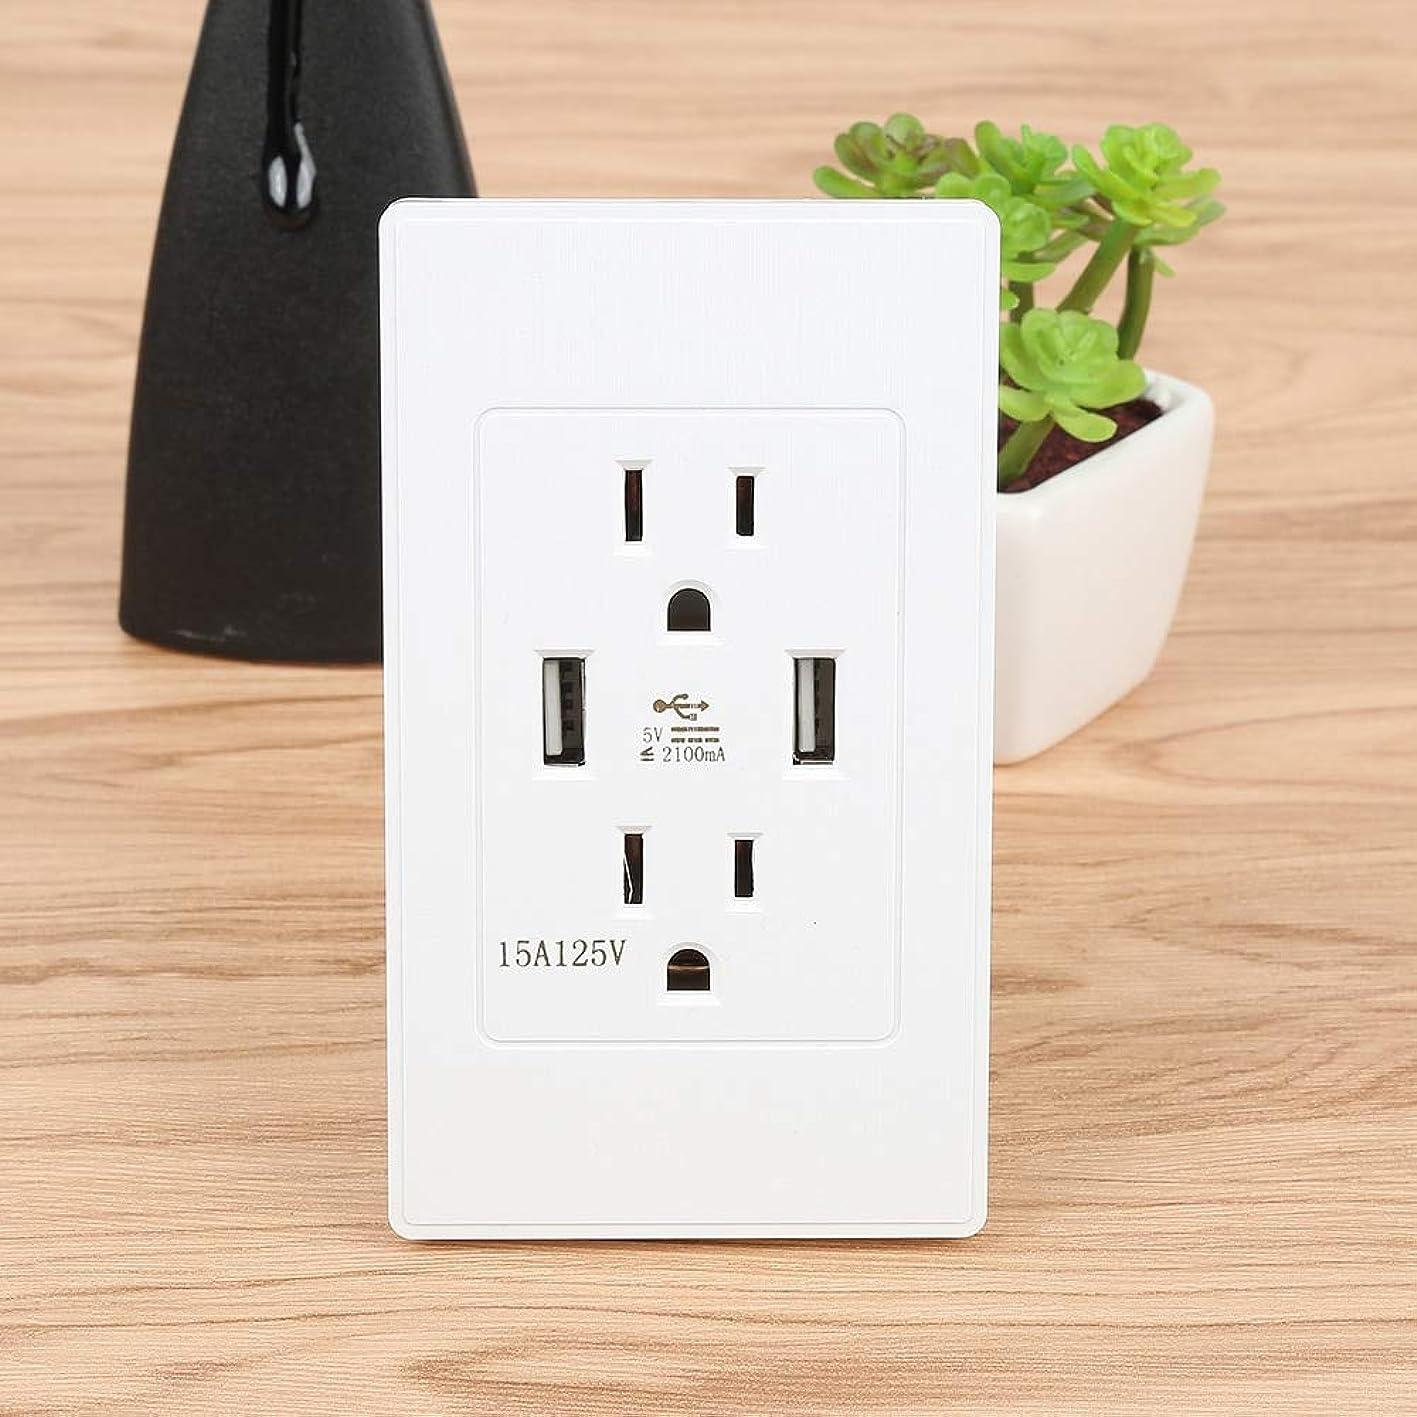 Jammas New Professional Dual USB Power Wall Charger Dock Socket Electric Power Outlet Panel Plate White US Plug Type - (Standard: us plug) tmrgjwwrrku630